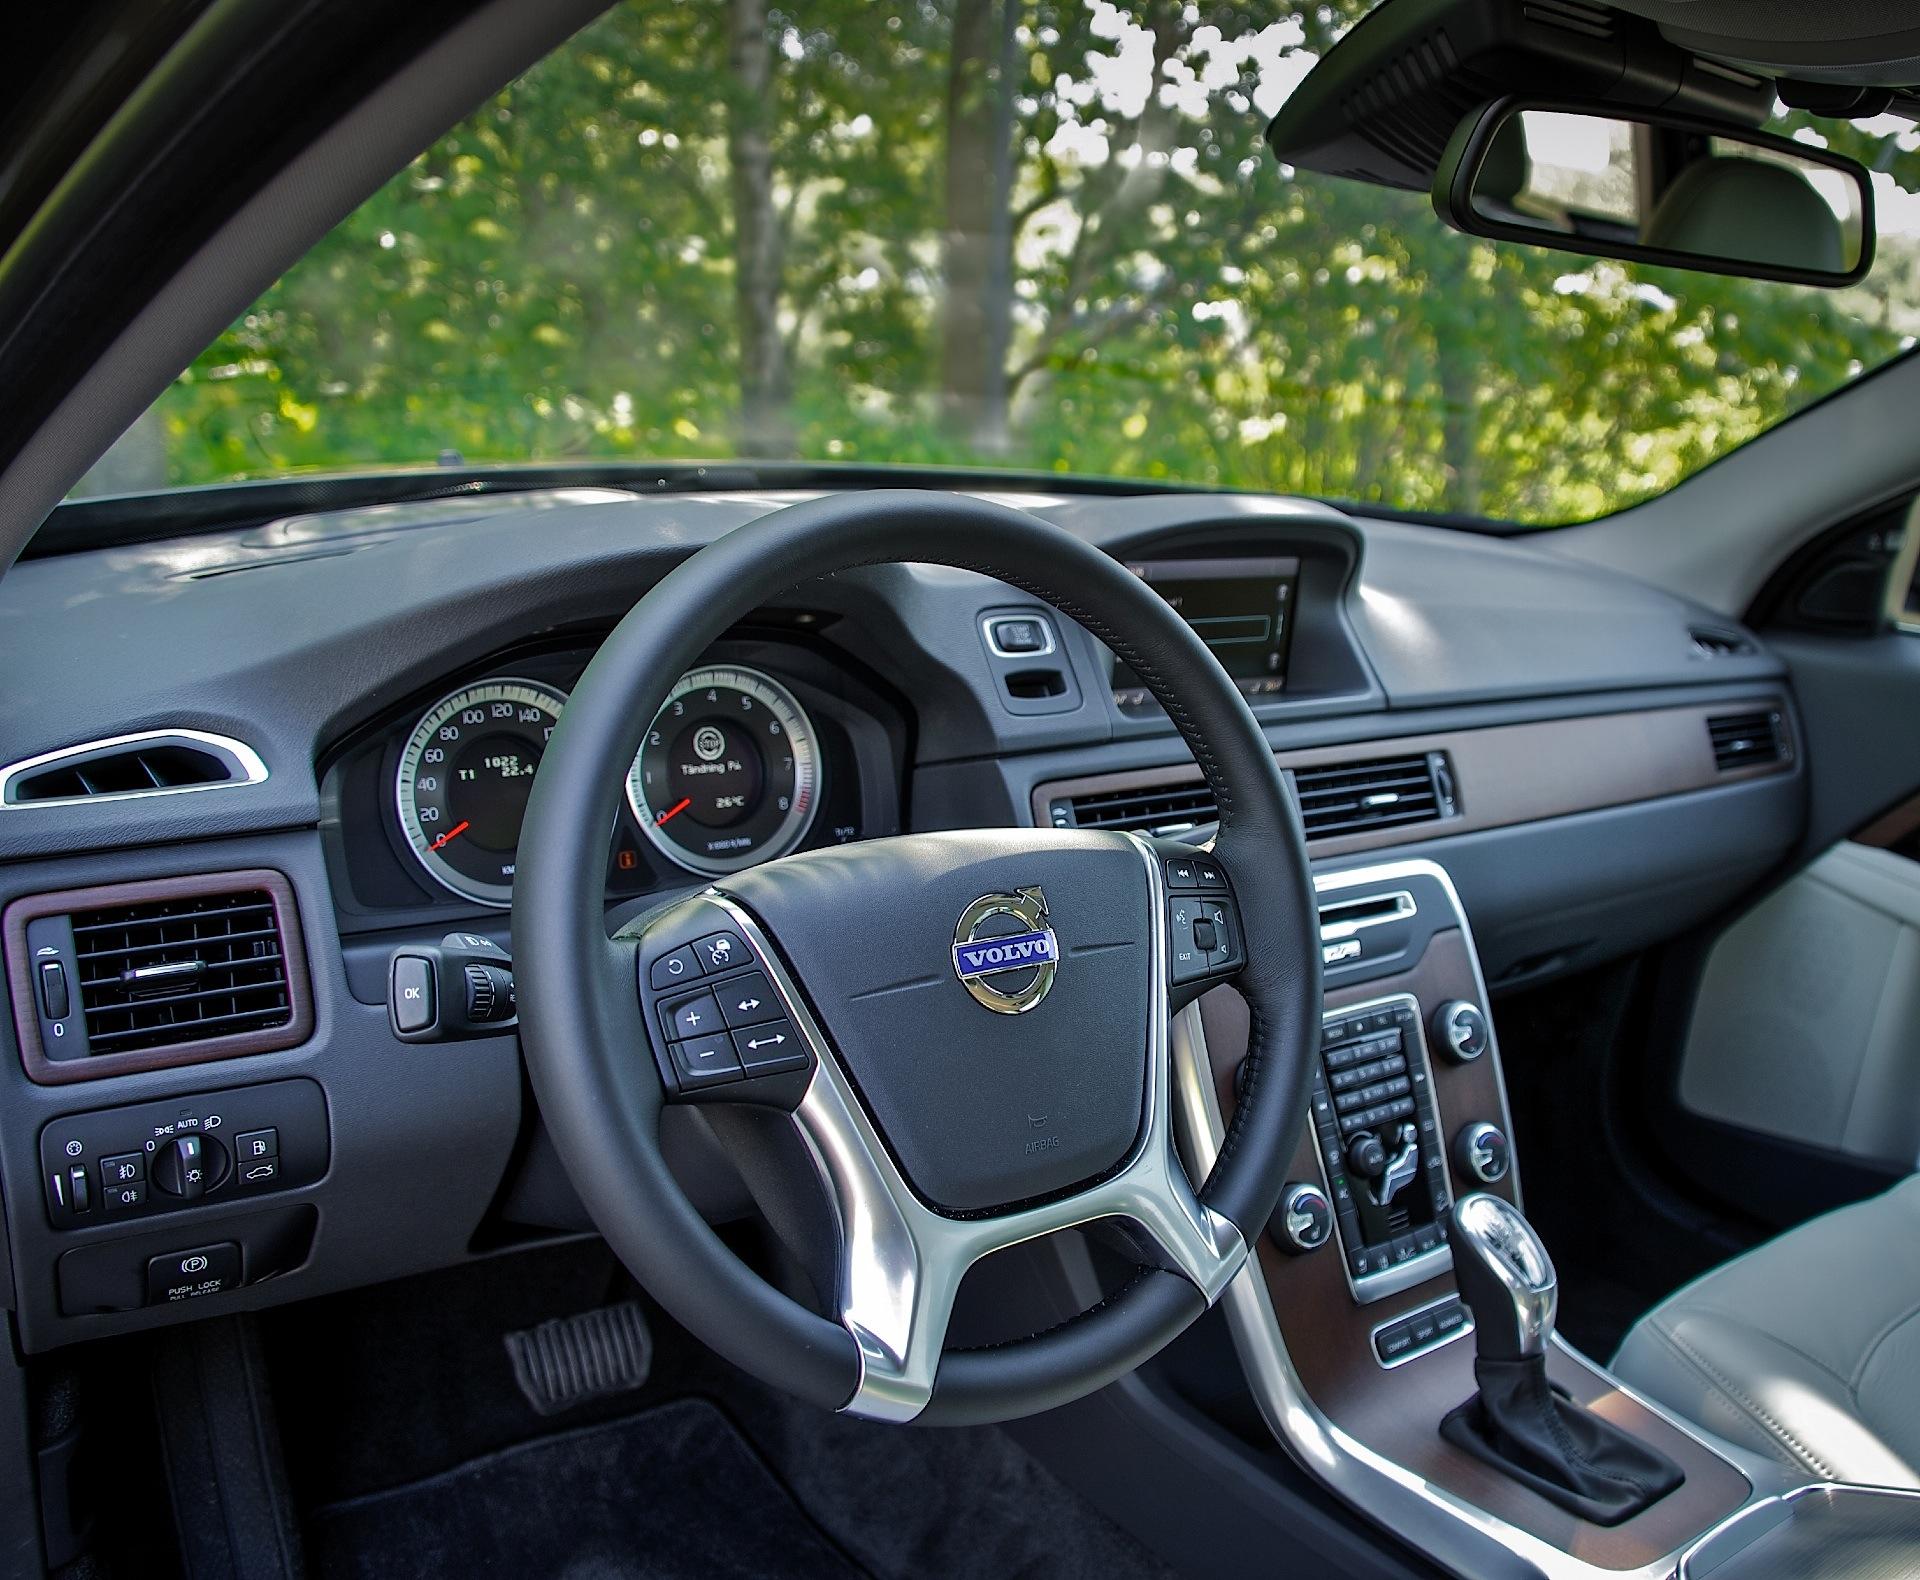 volvo xc70 specs 2007 2008 2009 2010 2011 2012 2013 2014 rh autoevolution com 2010 Volvo XC70 Exterior 2010 Volvo Wagon